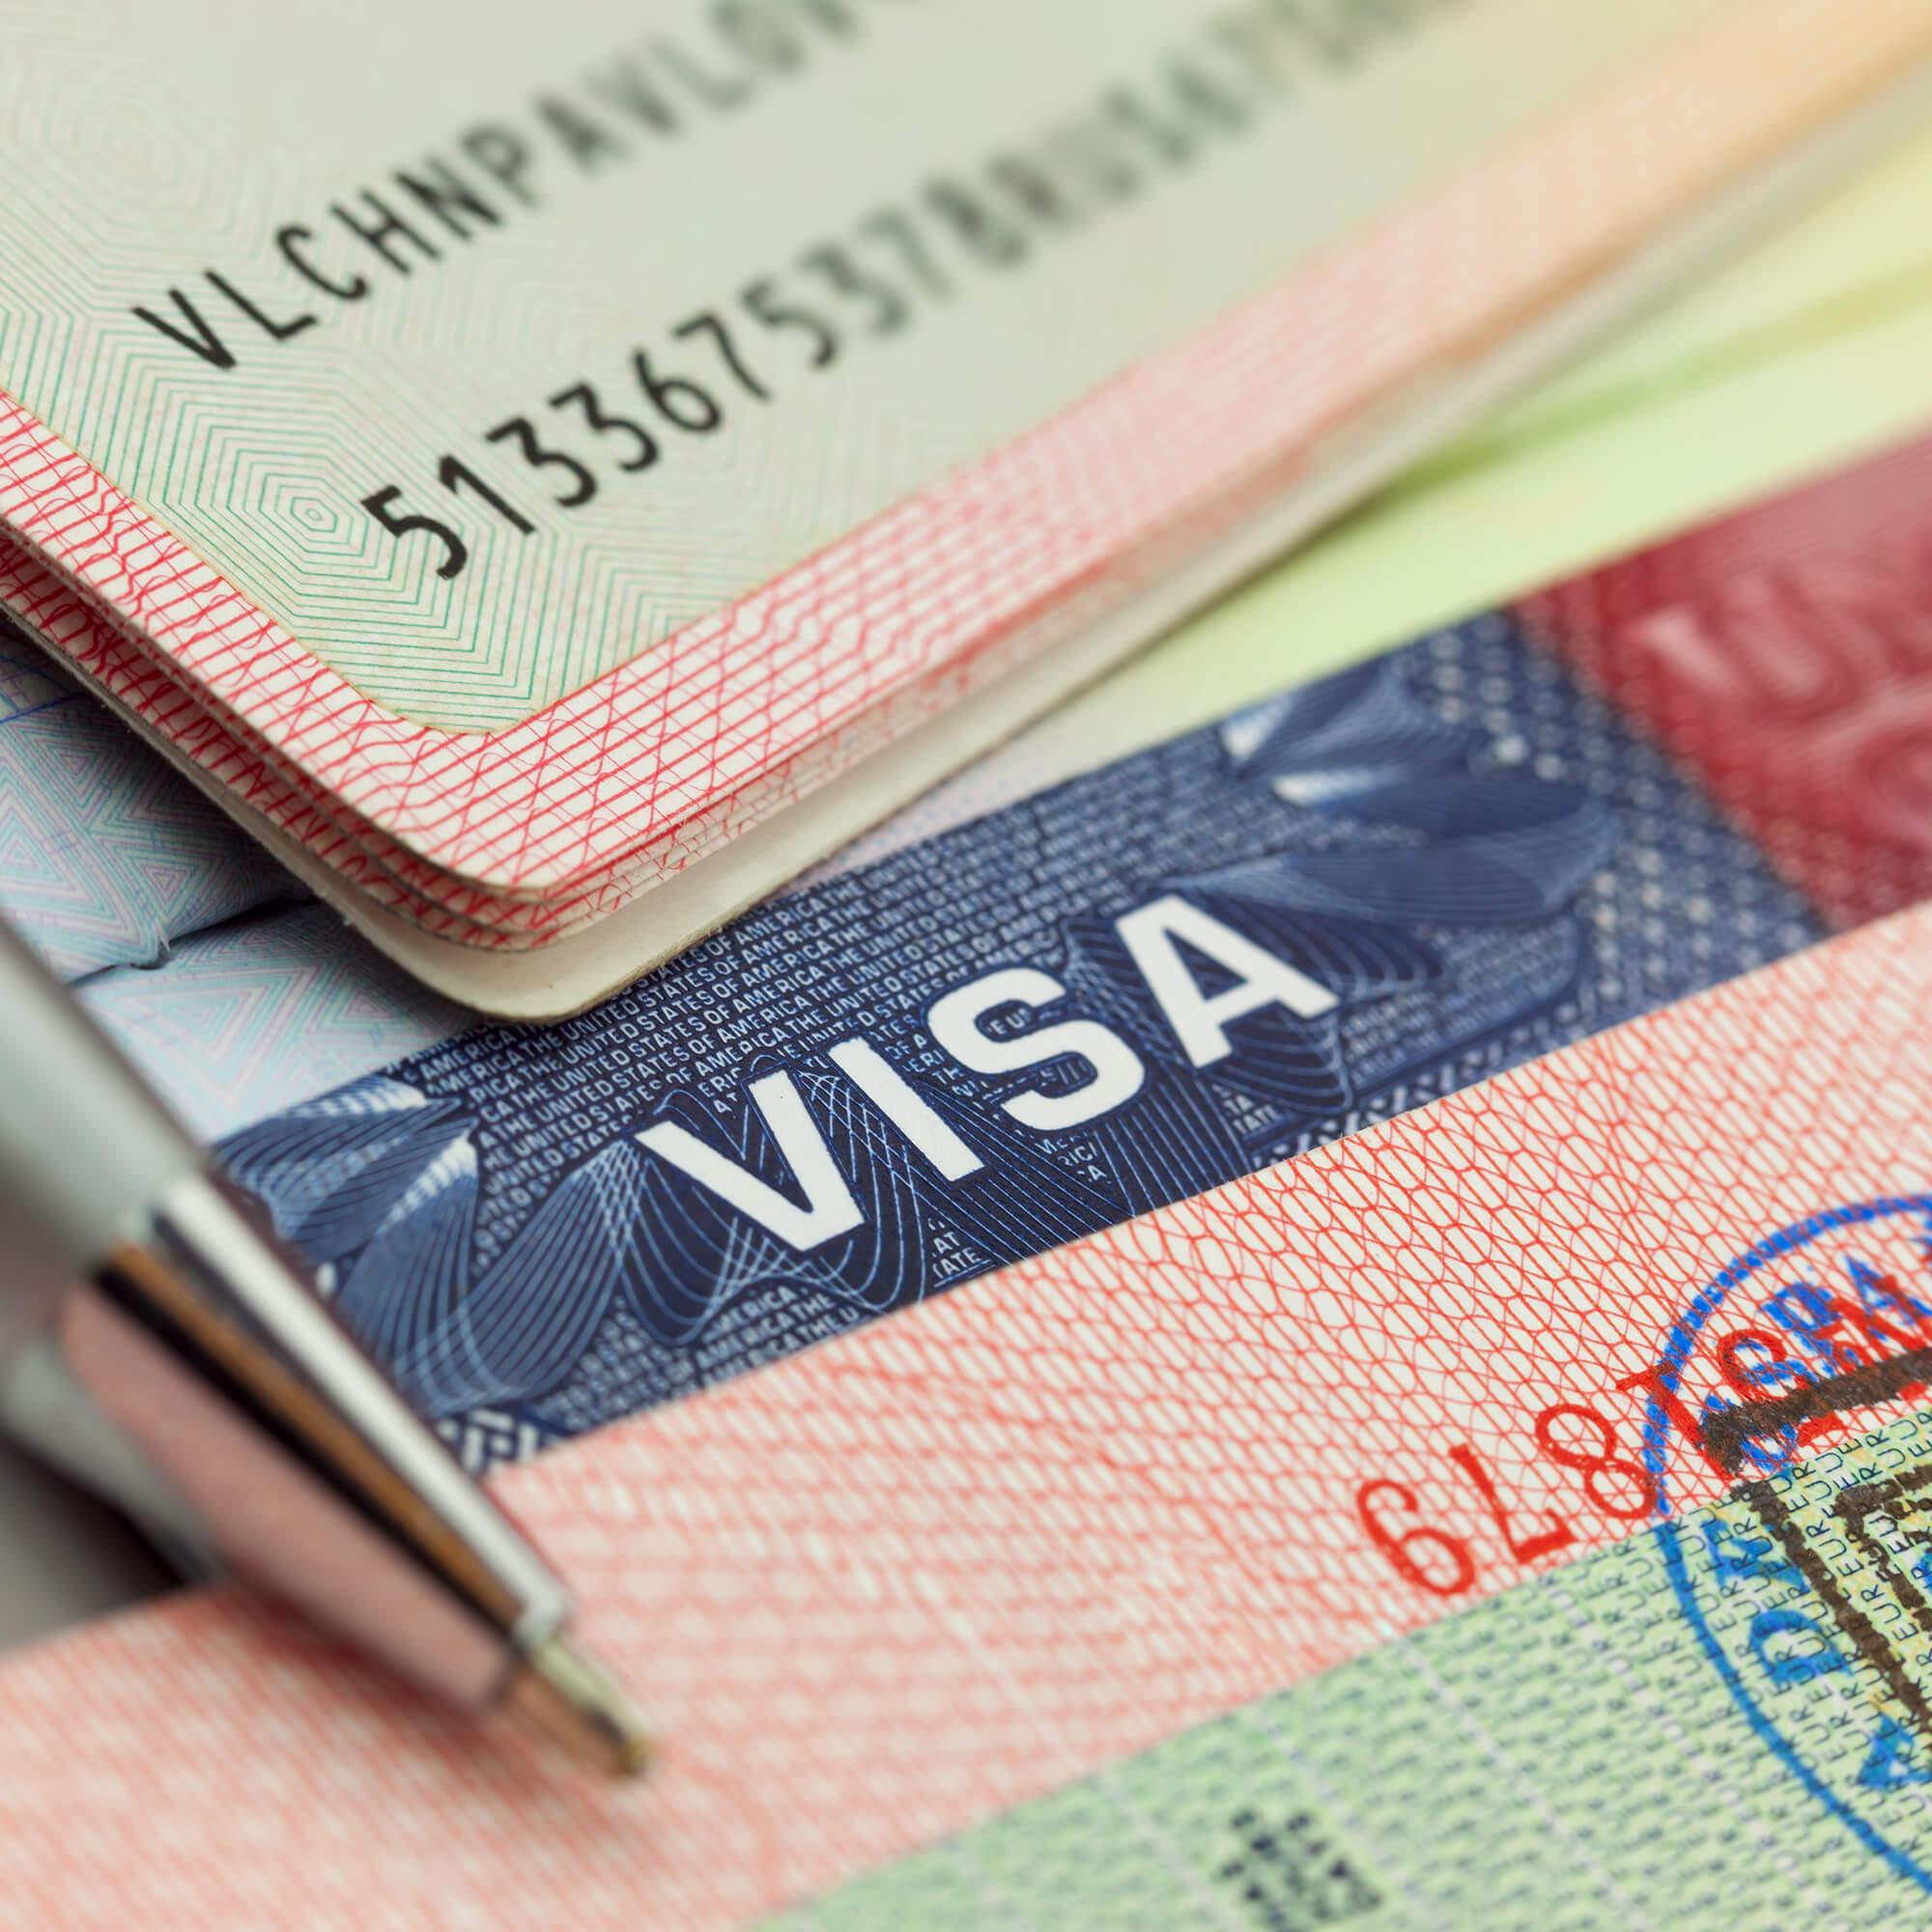 Visa and passport documents